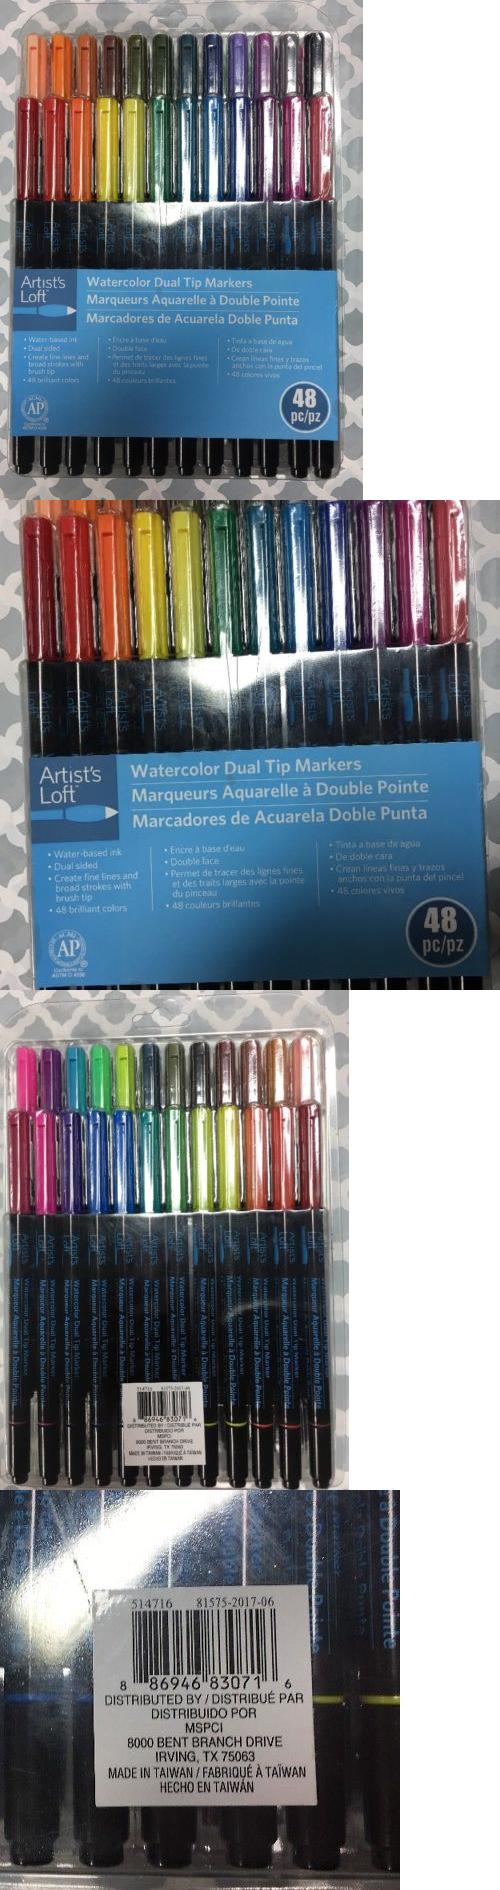 Watercolor Dual Tip Markers By Artist S Loft 24 Ct Artist Loft